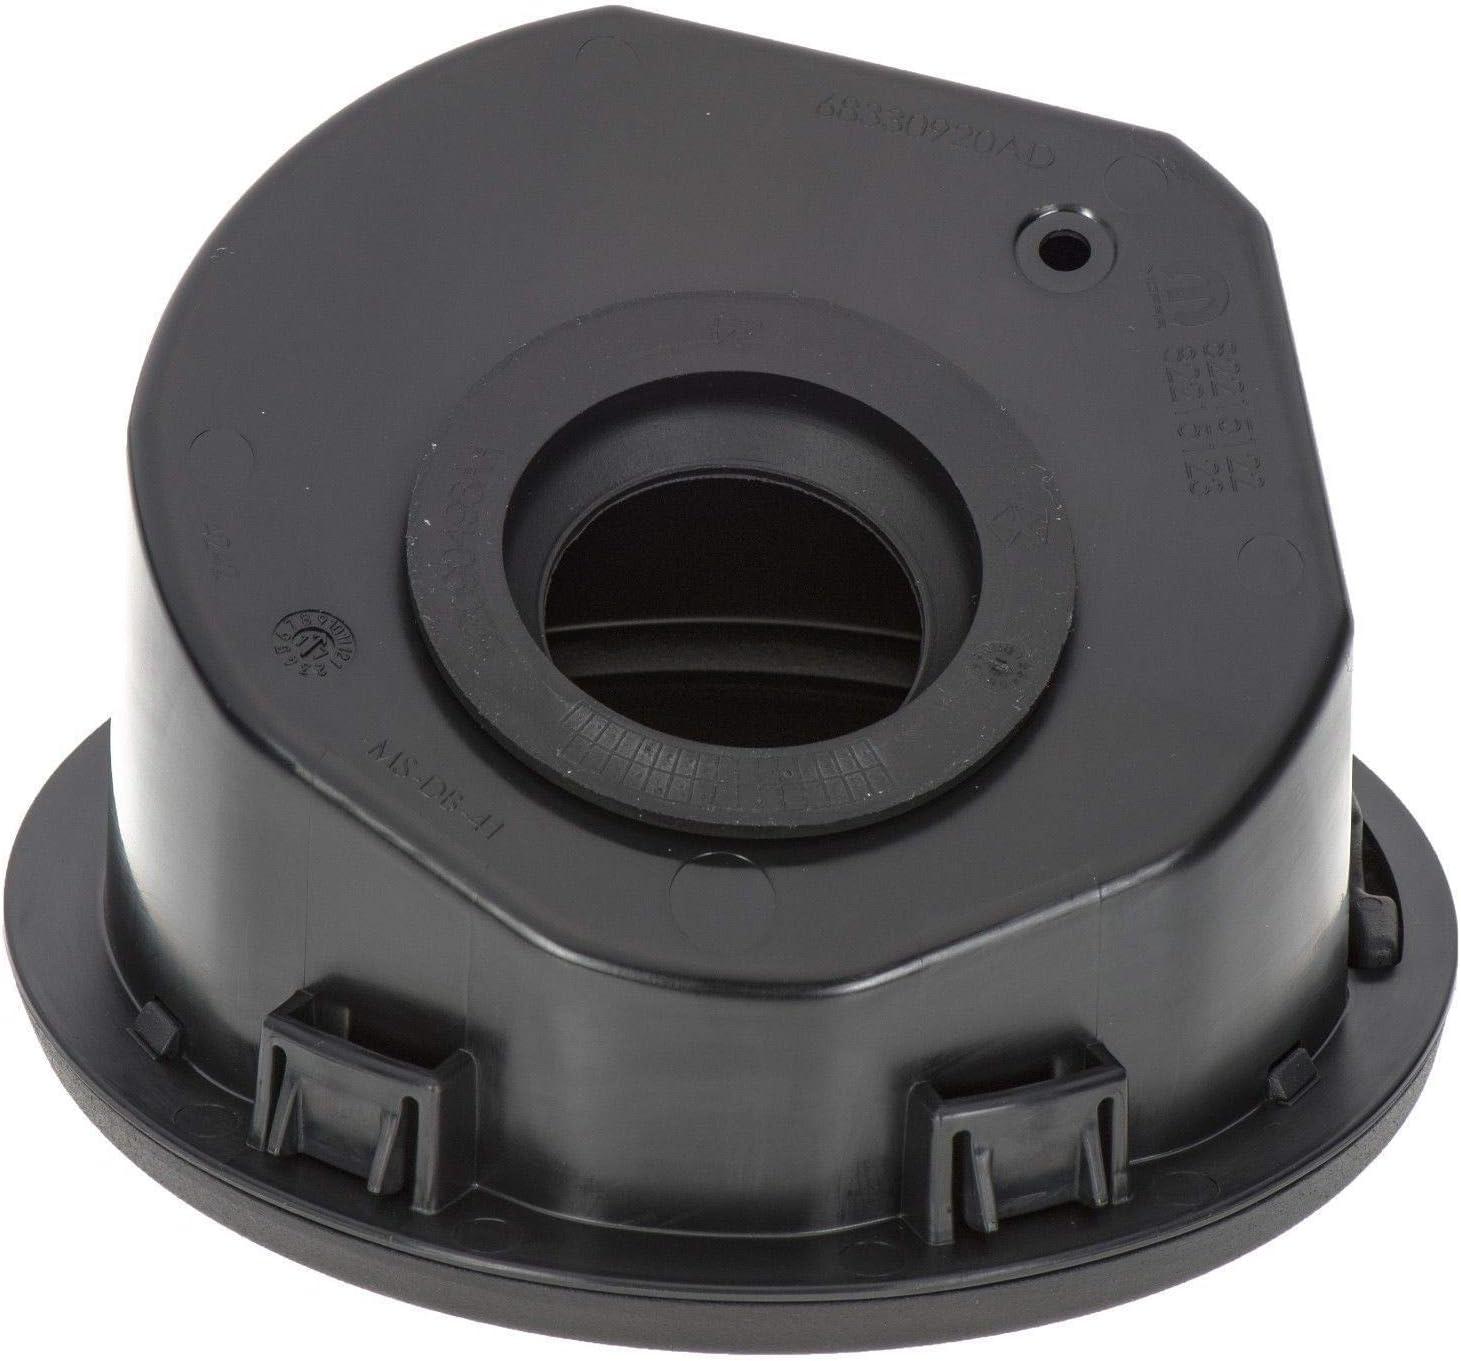 Fuel Filler Door Gas Tank Cap Cover Accessories For Jeep 2018-2019 Wrangler JL Black Satin